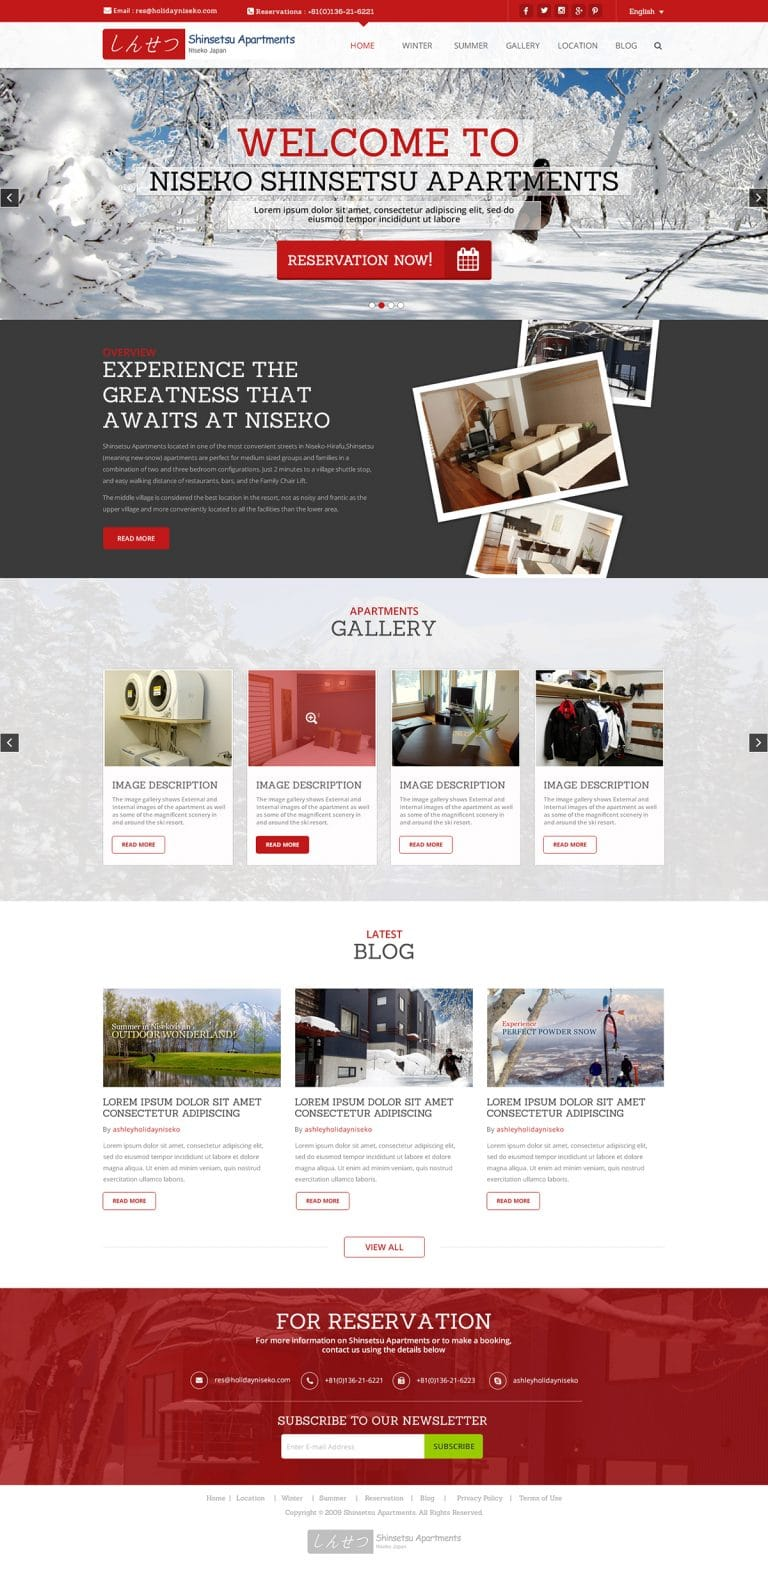 Atanu Das - Remote IT Consultant - Web Design Template #2